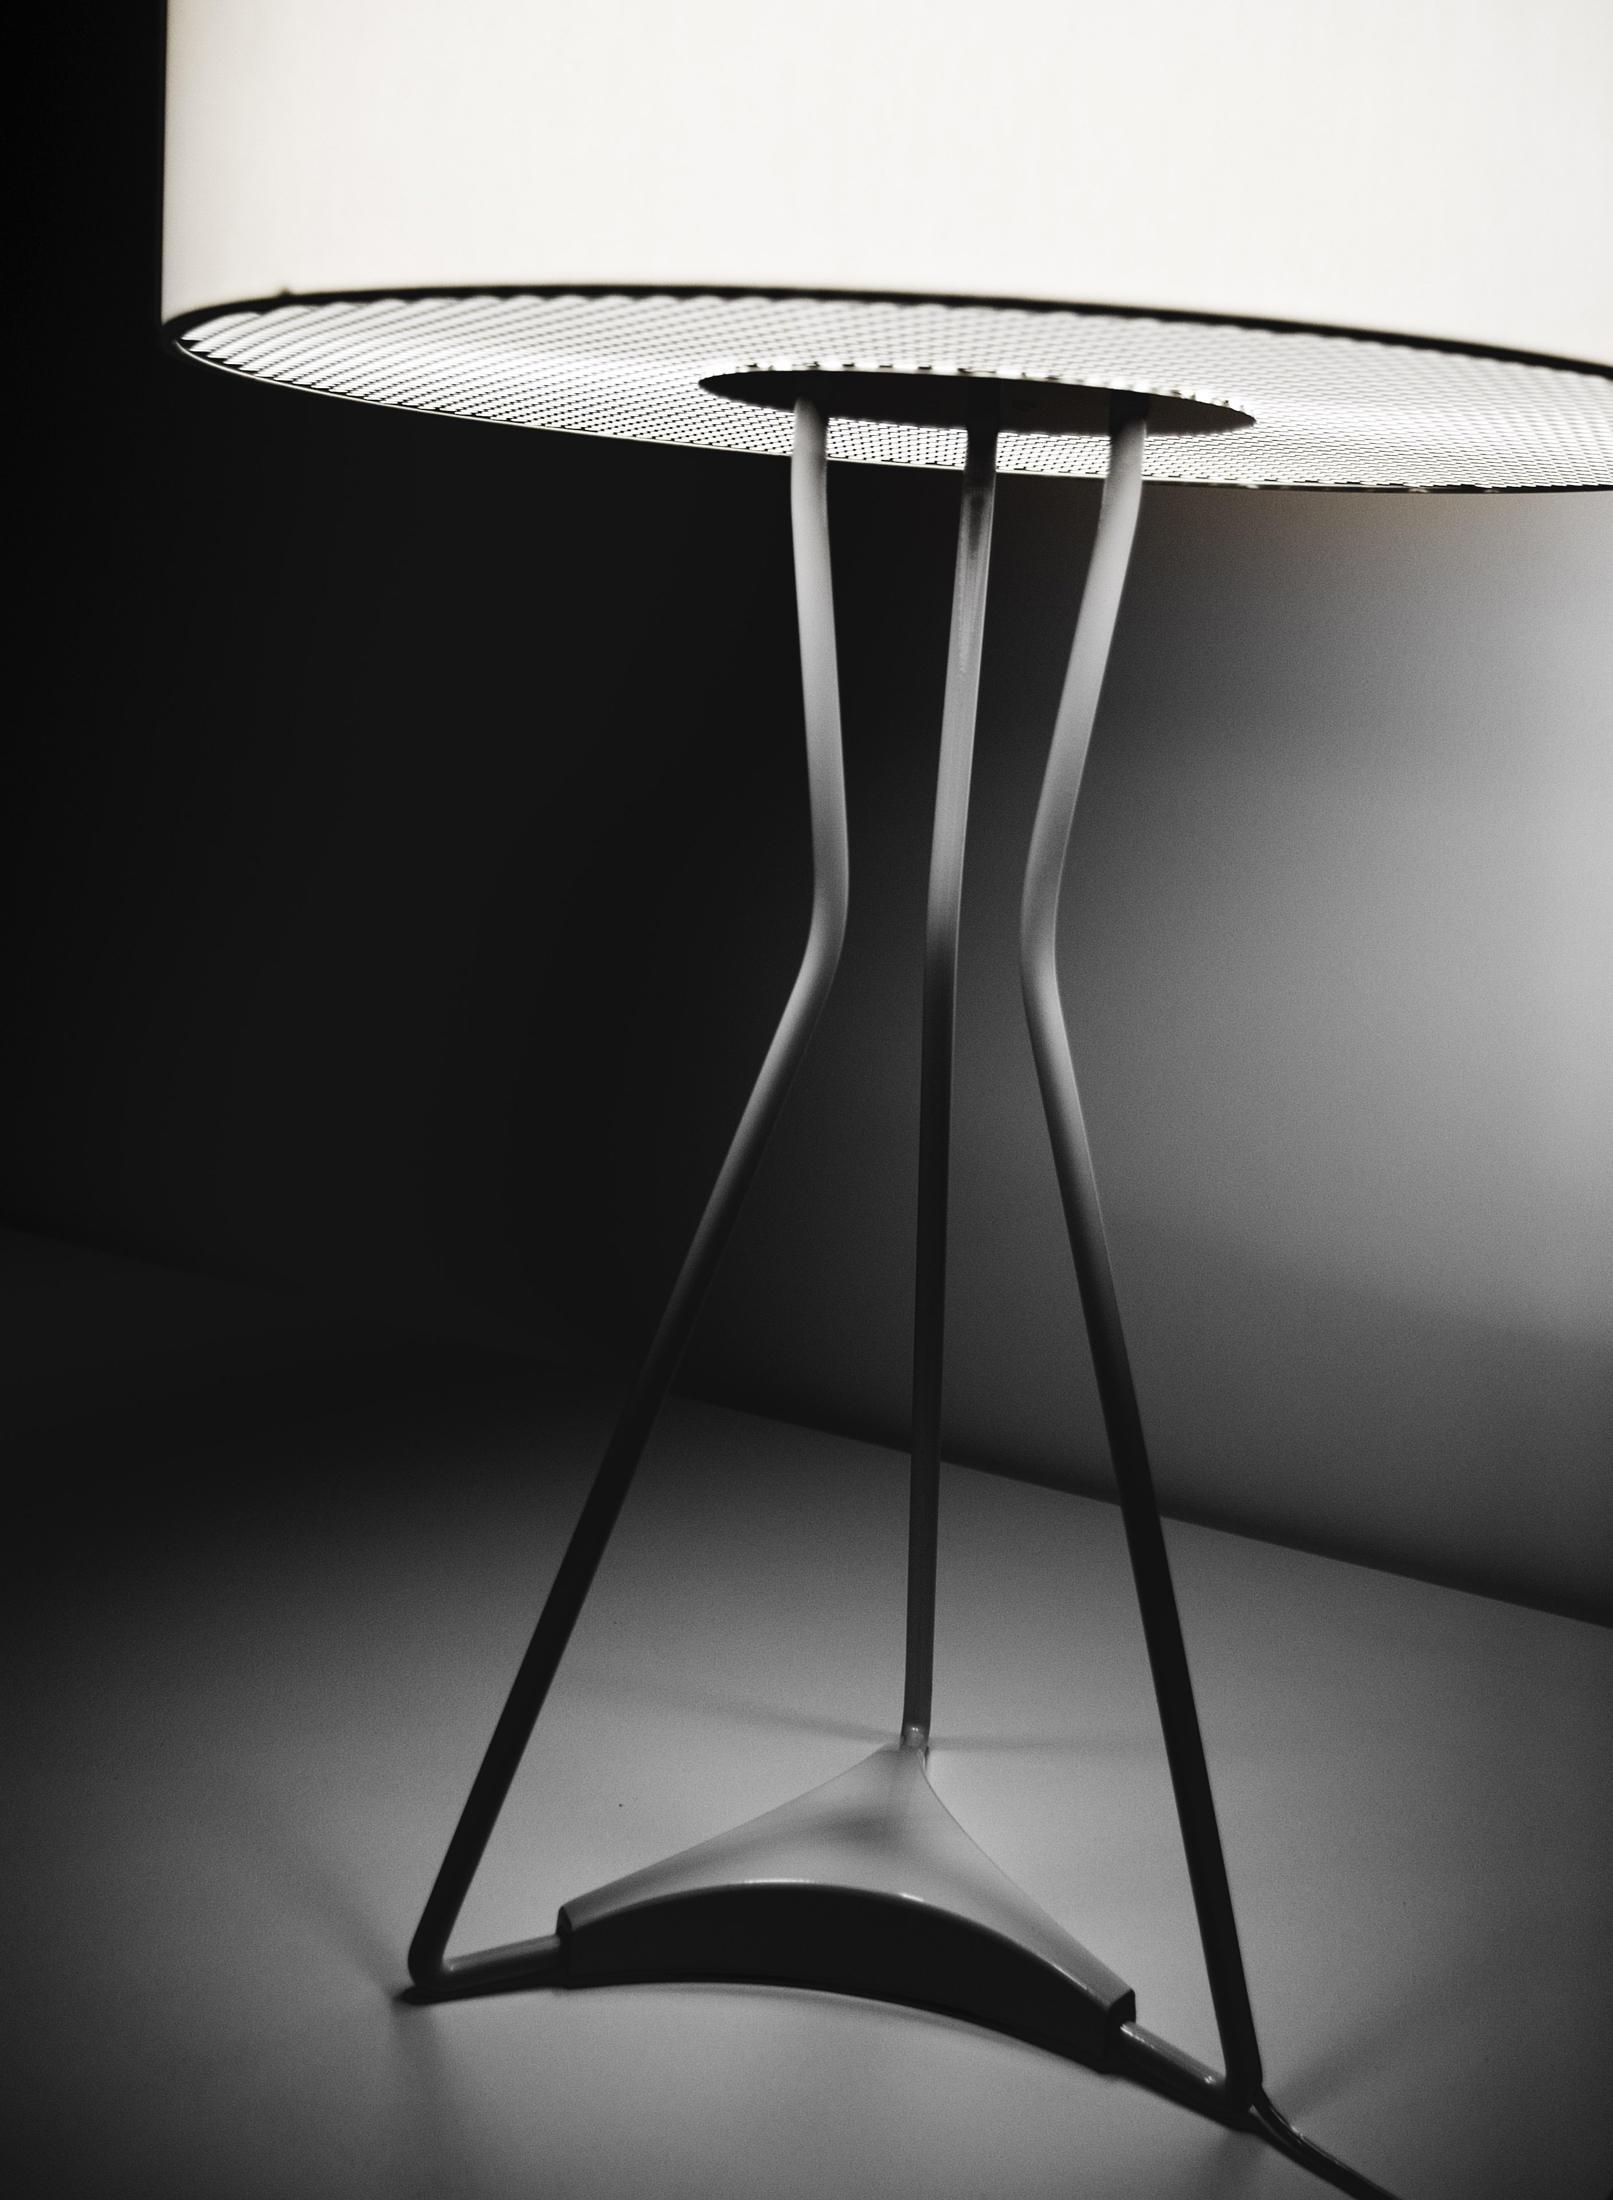 estiluz lighting. Testa M-2817 Table Lamp By Estiluz Lighting